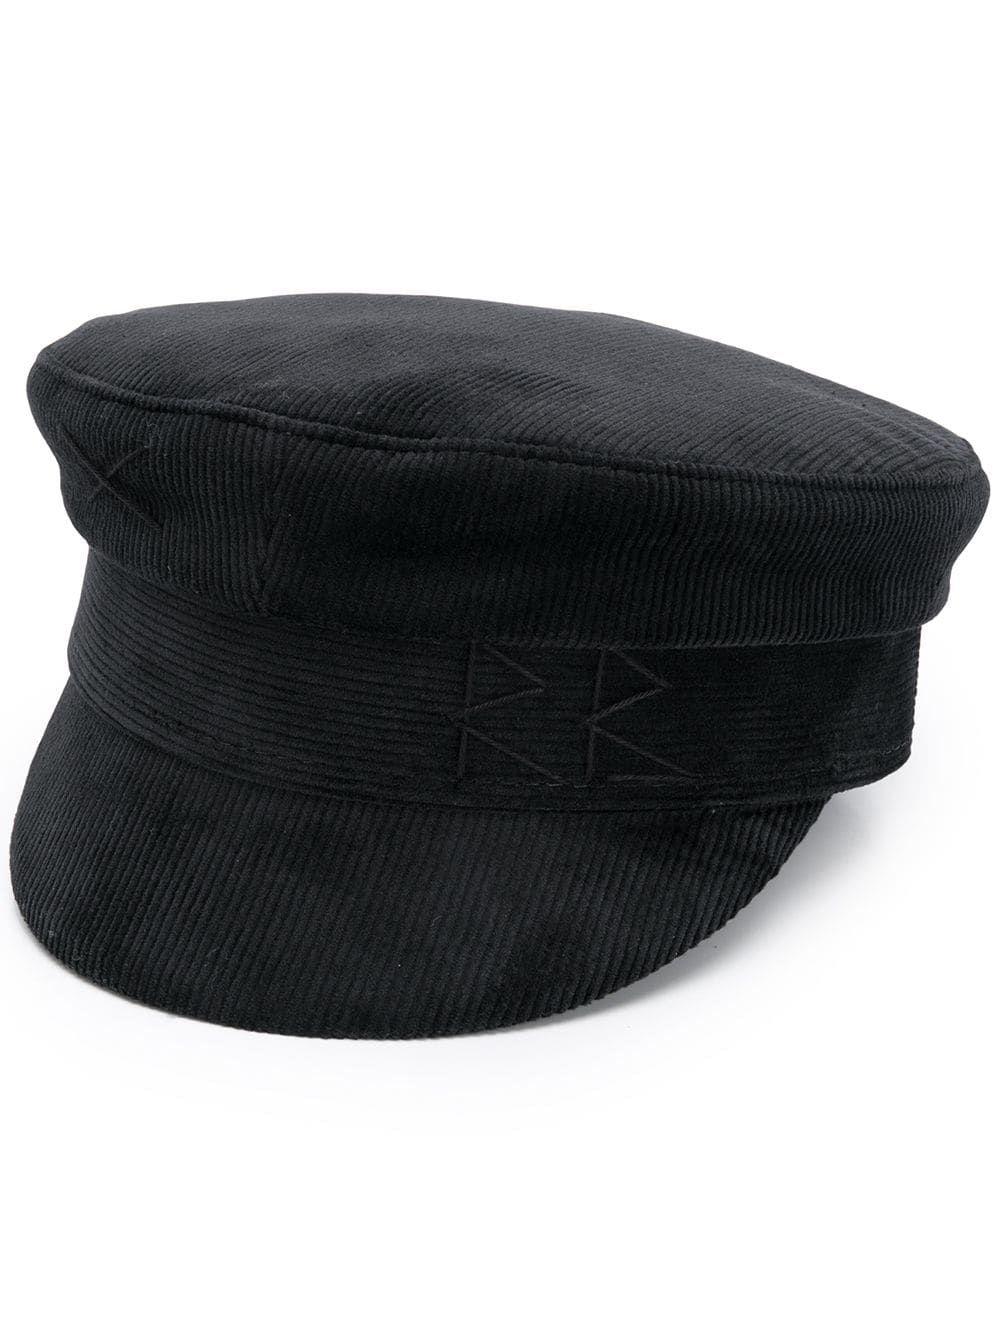 36869bf16102 Ruslan Baginskiy Velvet Baker Cap in 2019 | Products | Baker boy cap ...